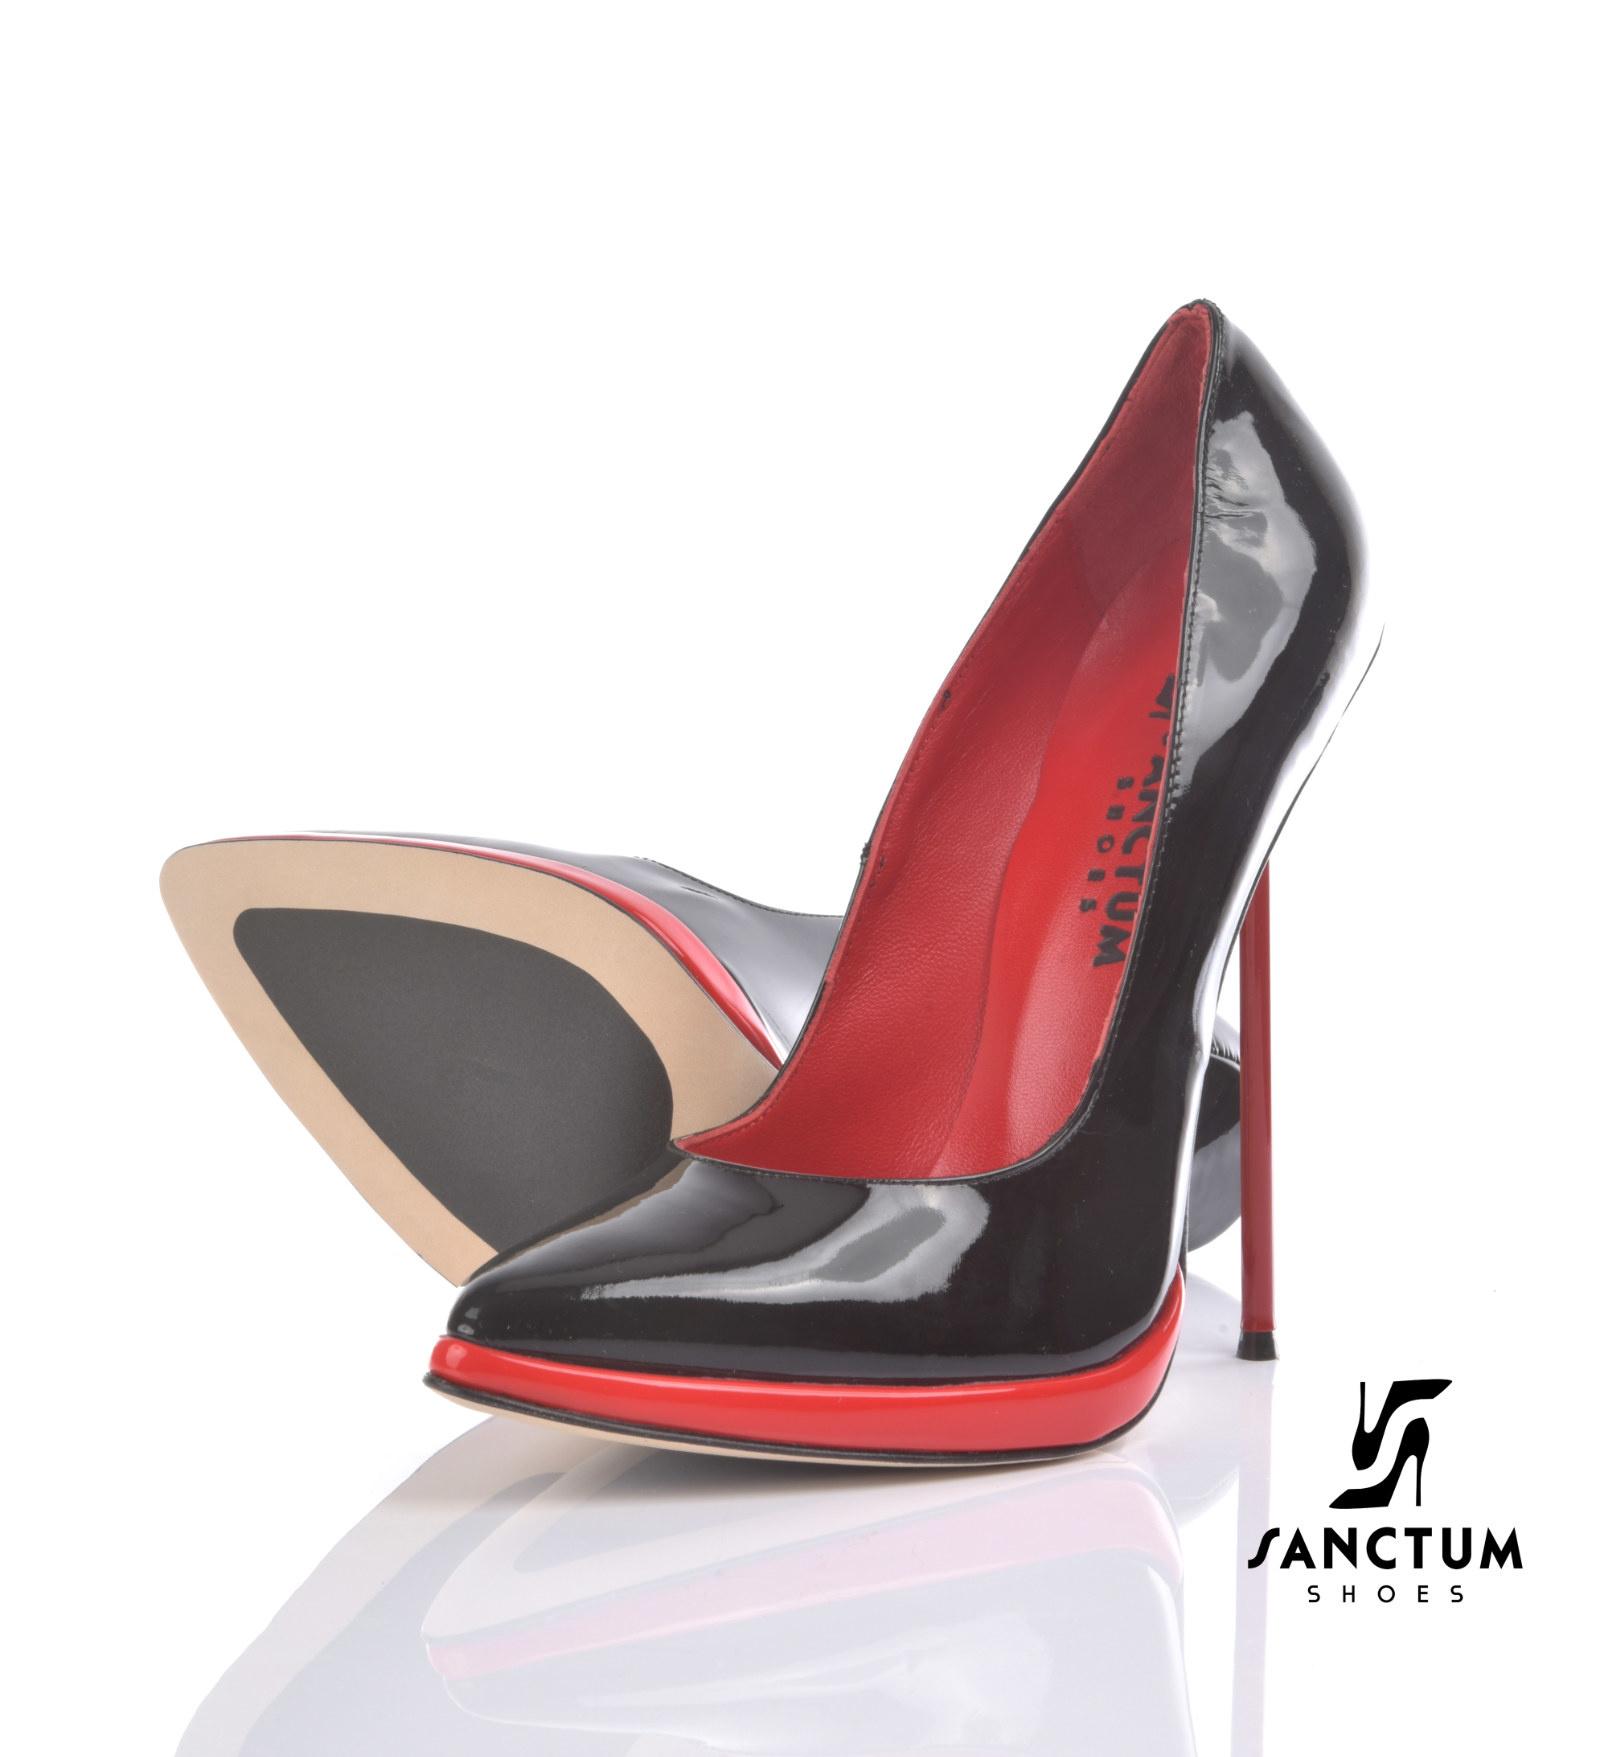 Italian High Heels by Sanctum Shoes